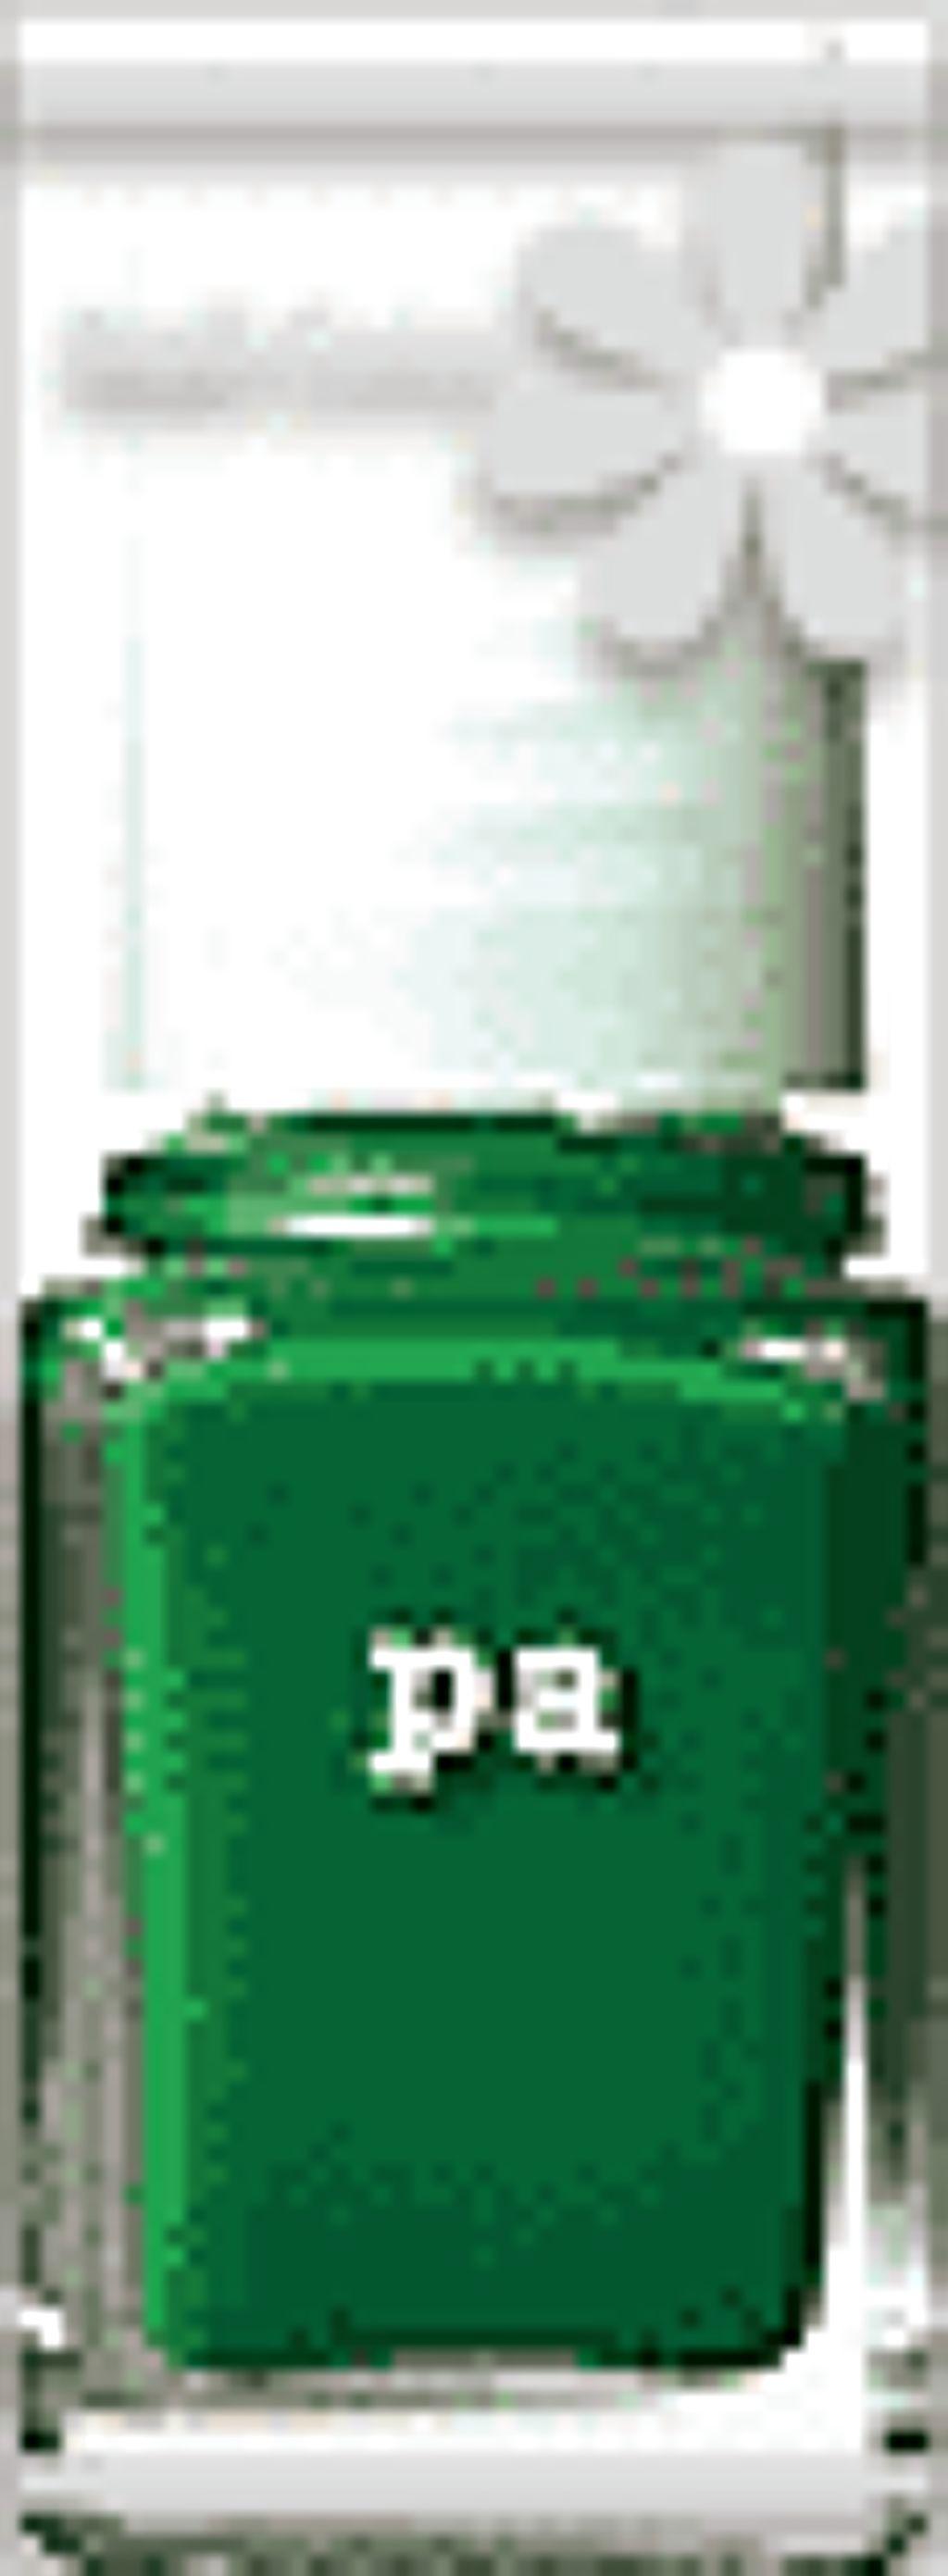 pa ネイルカラー(旧) A96